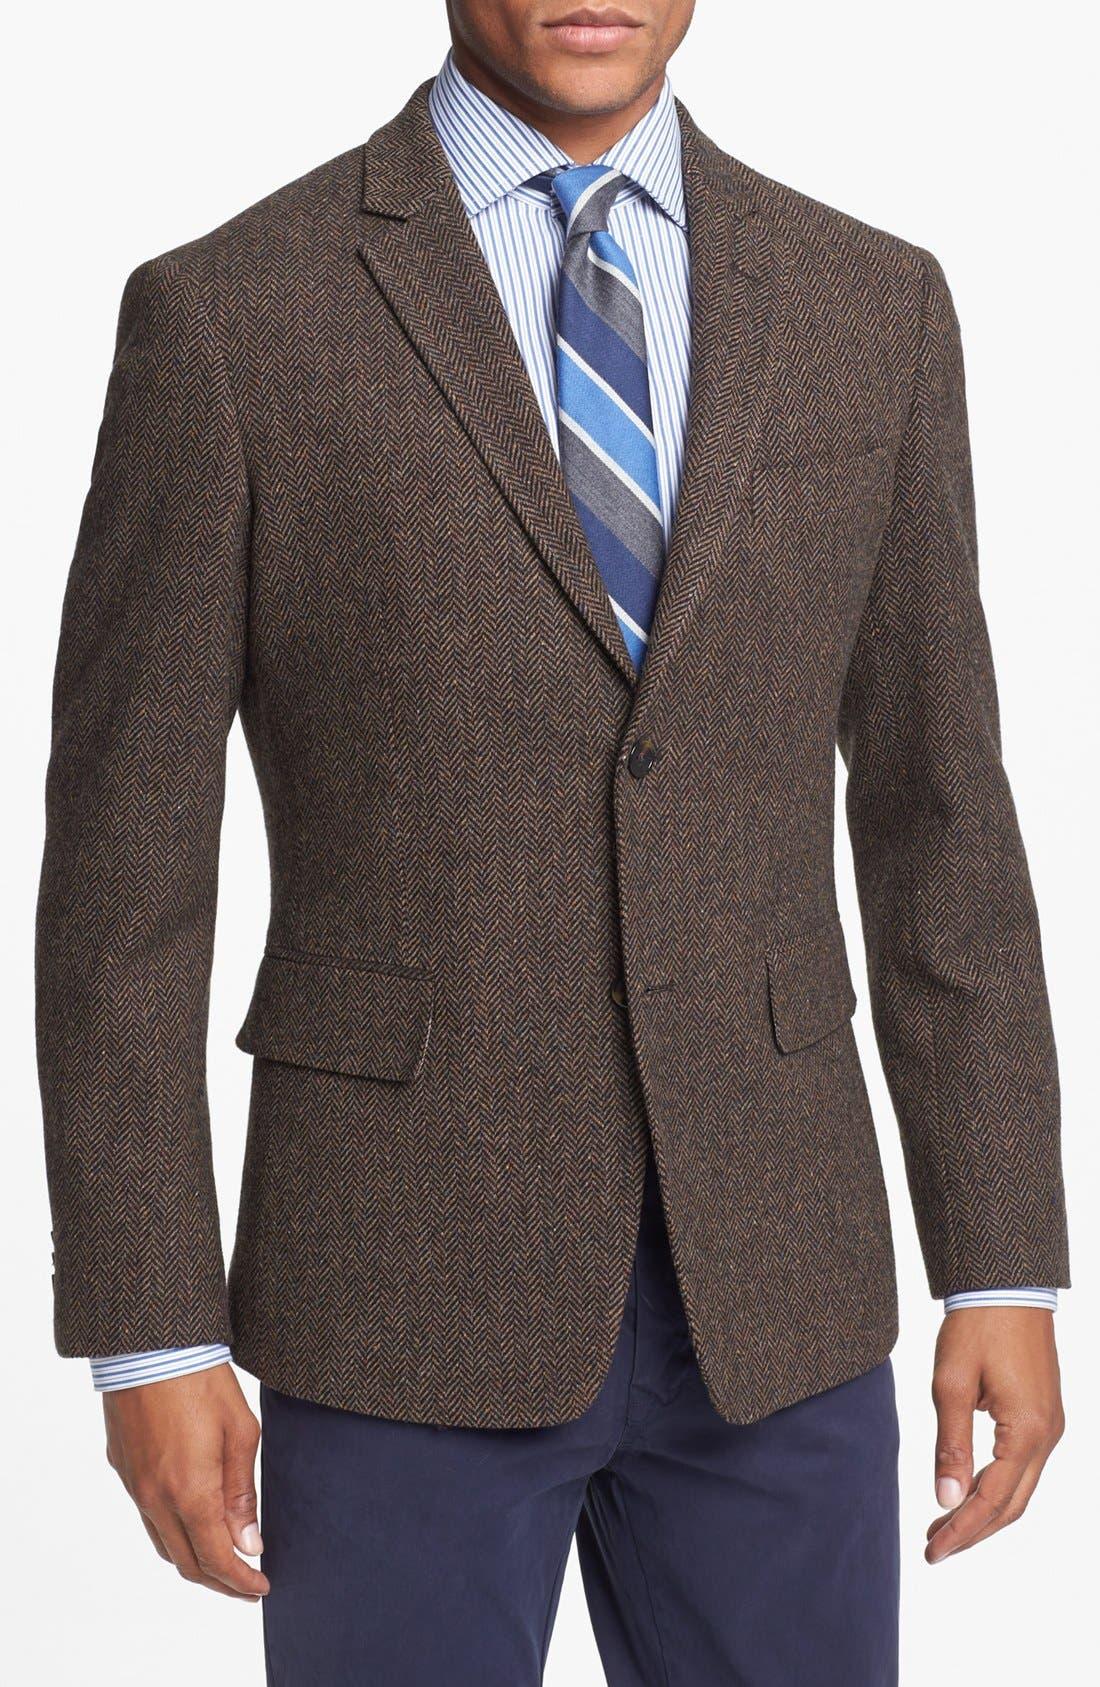 Main Image - Wallin & Bros. Extra Trim Fit Herringbone Sportcoat